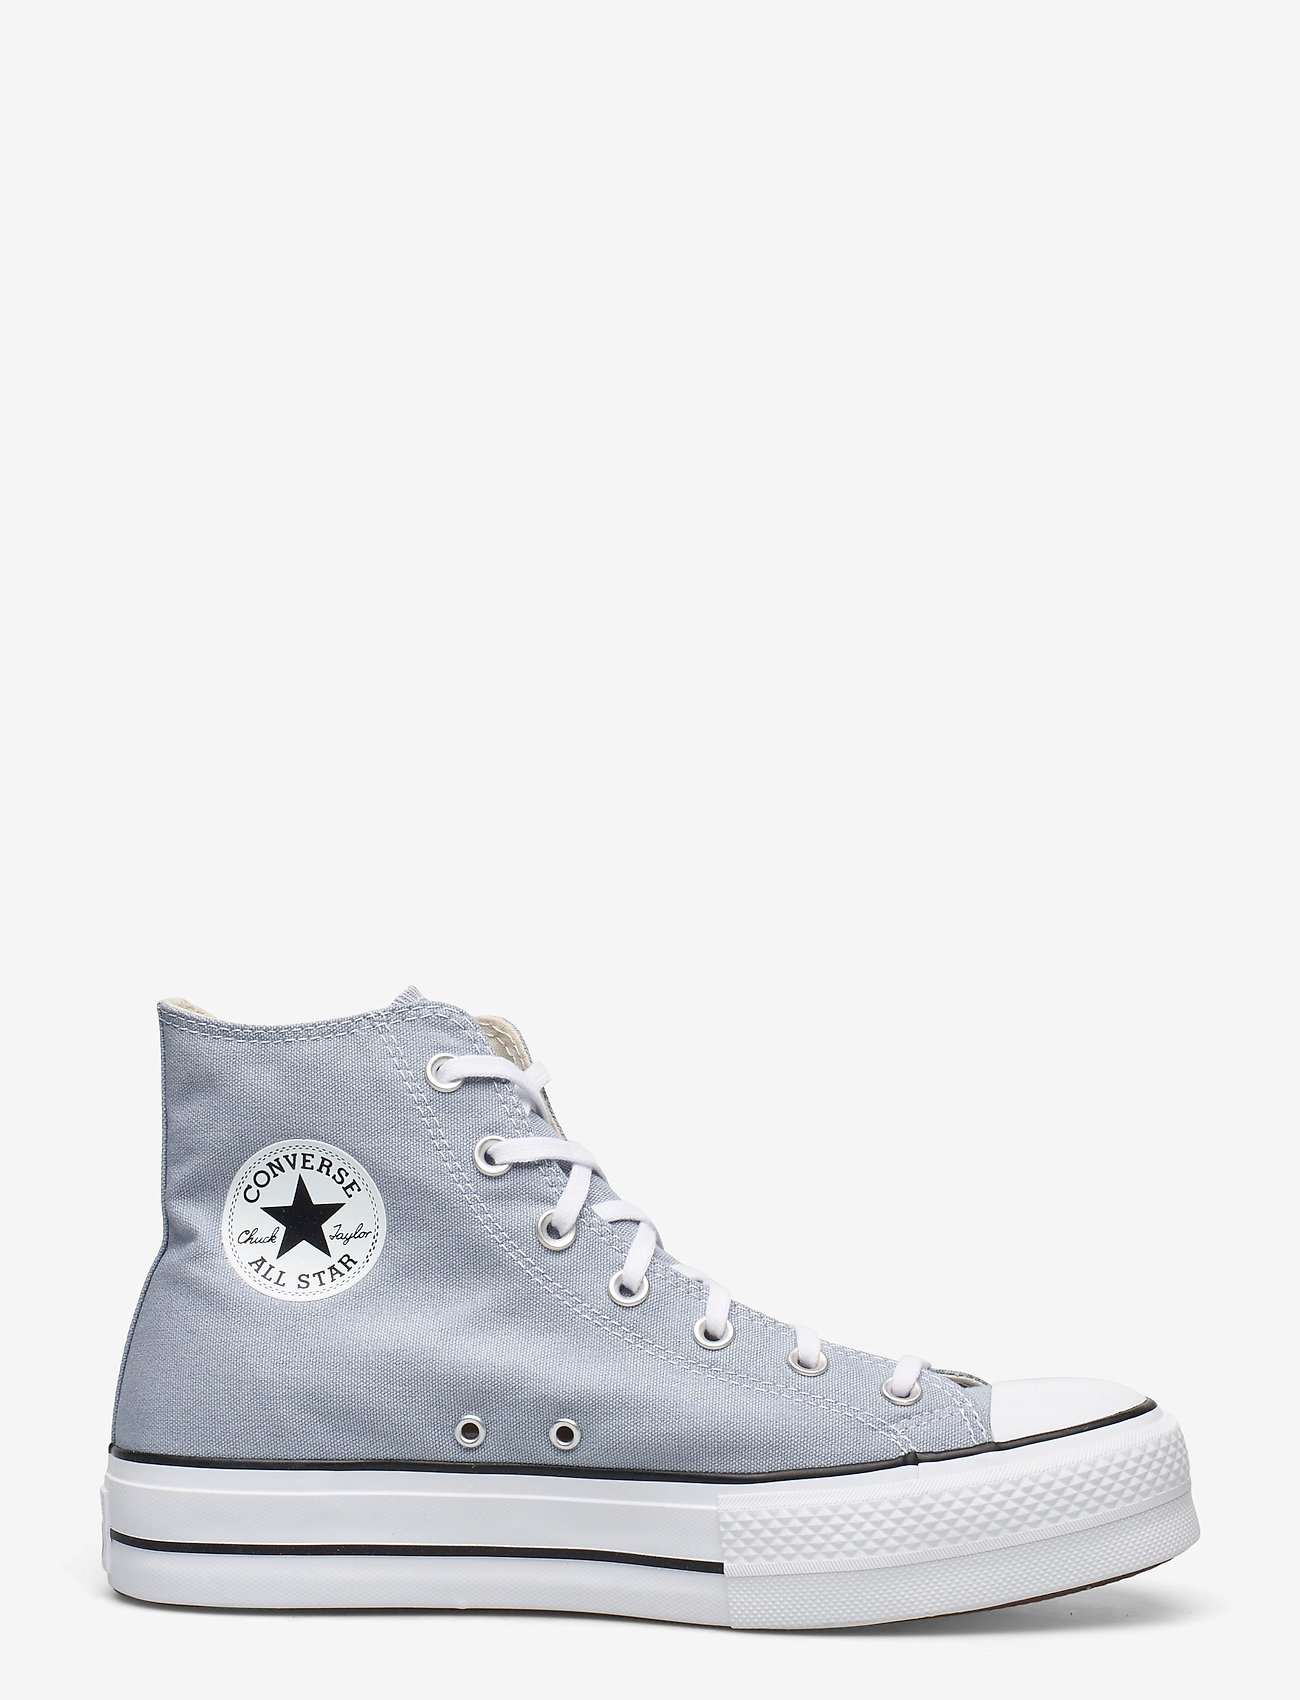 Converse - CTAS LIFT HI OBSIDIAN MIST/WHITE/BLACK - hoge sneakers - obsidian mist/white/black - 1